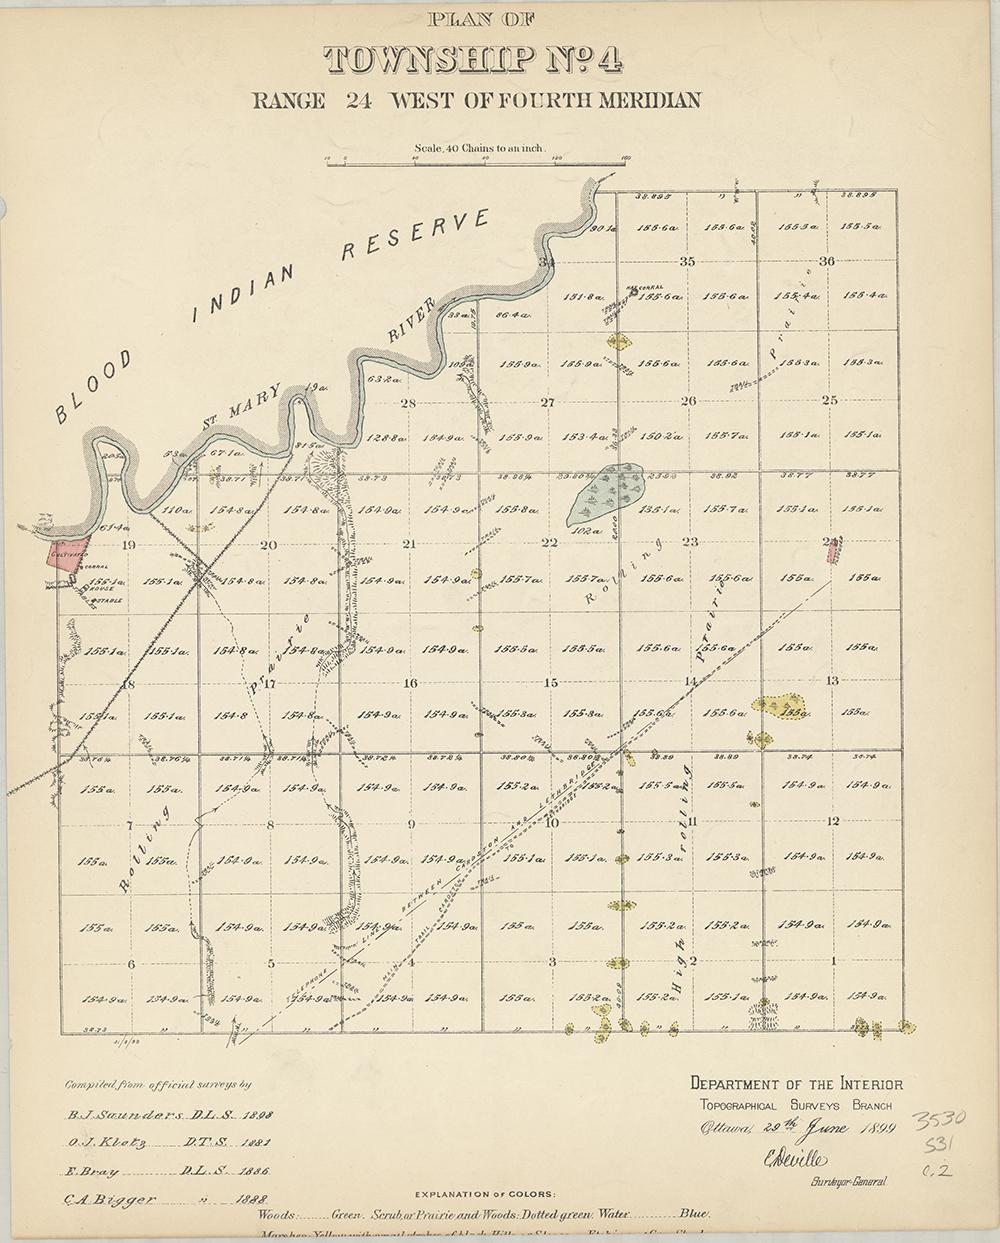 Plan of Township No.4